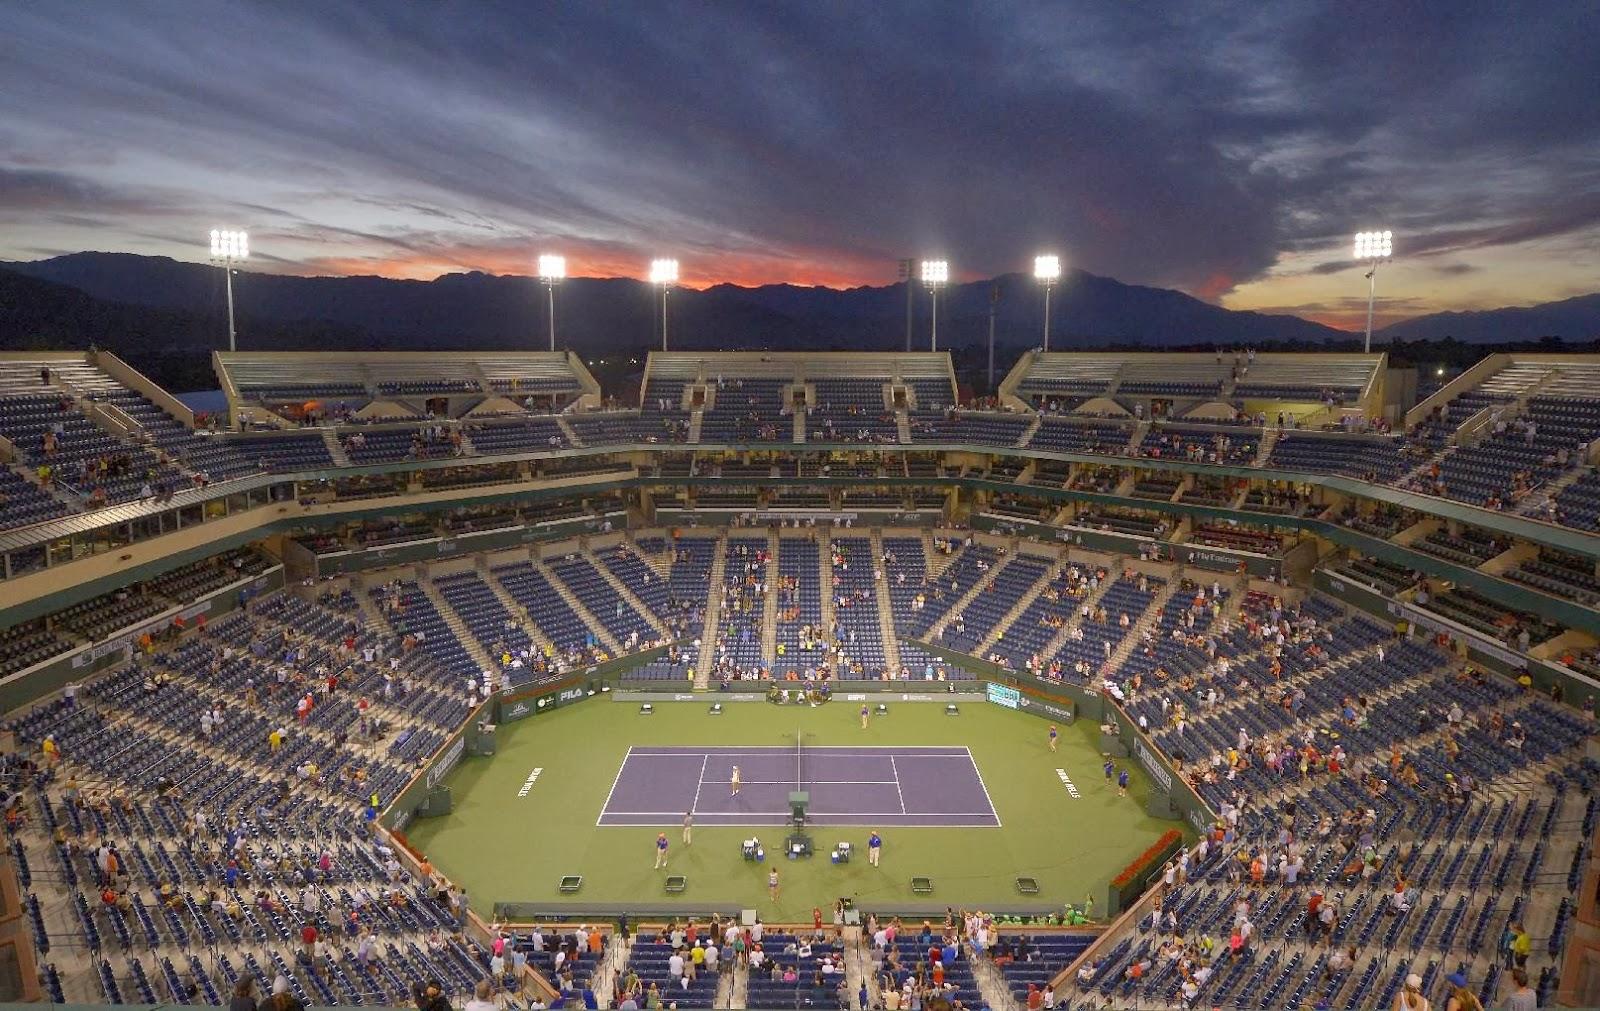 tennis the game of passion blog bnp paribas open 2014. Black Bedroom Furniture Sets. Home Design Ideas